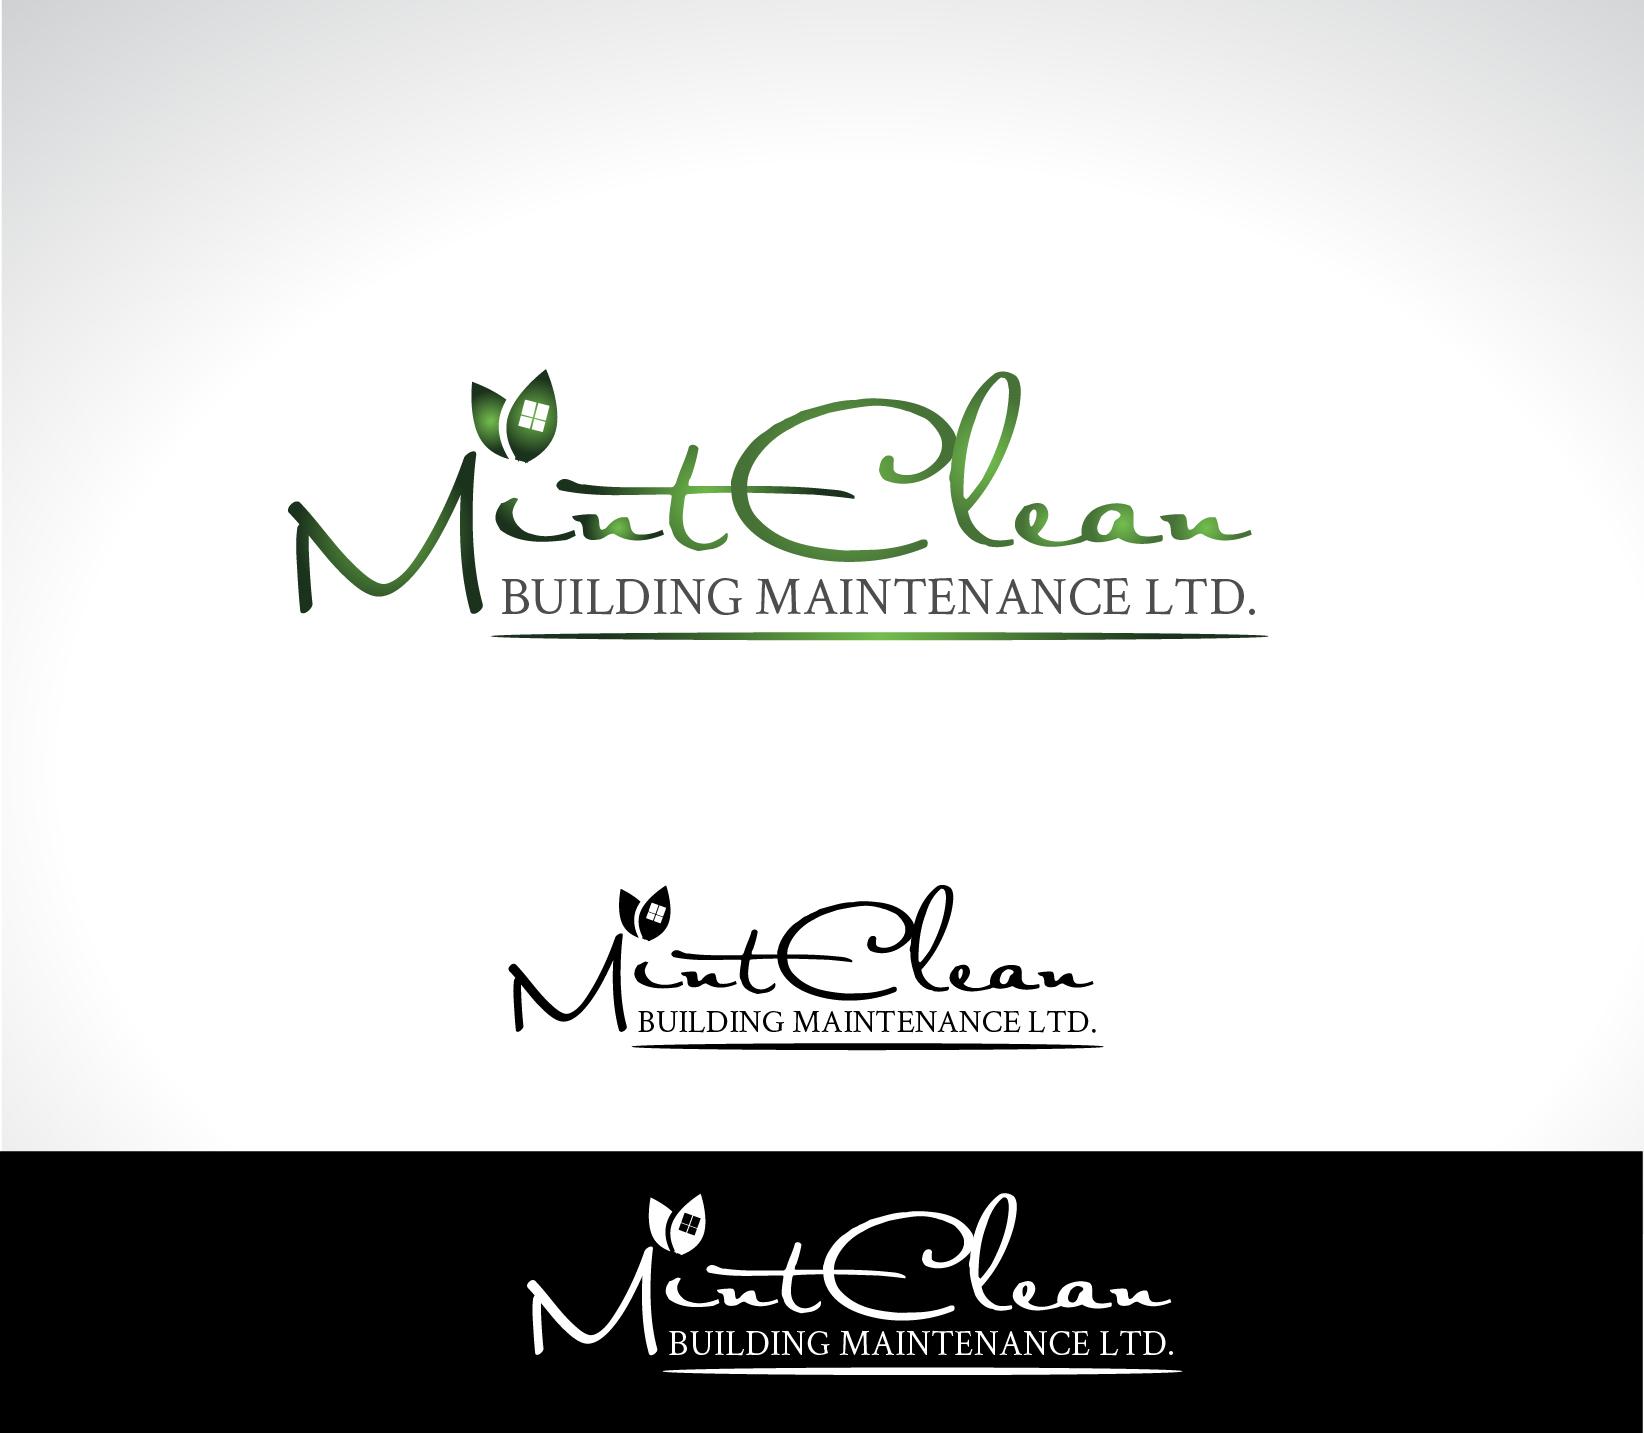 Logo Design by Darina Dimitrova - Entry No. 118 in the Logo Design Contest MintClean Building Maintenance Ltd. Logo Design.